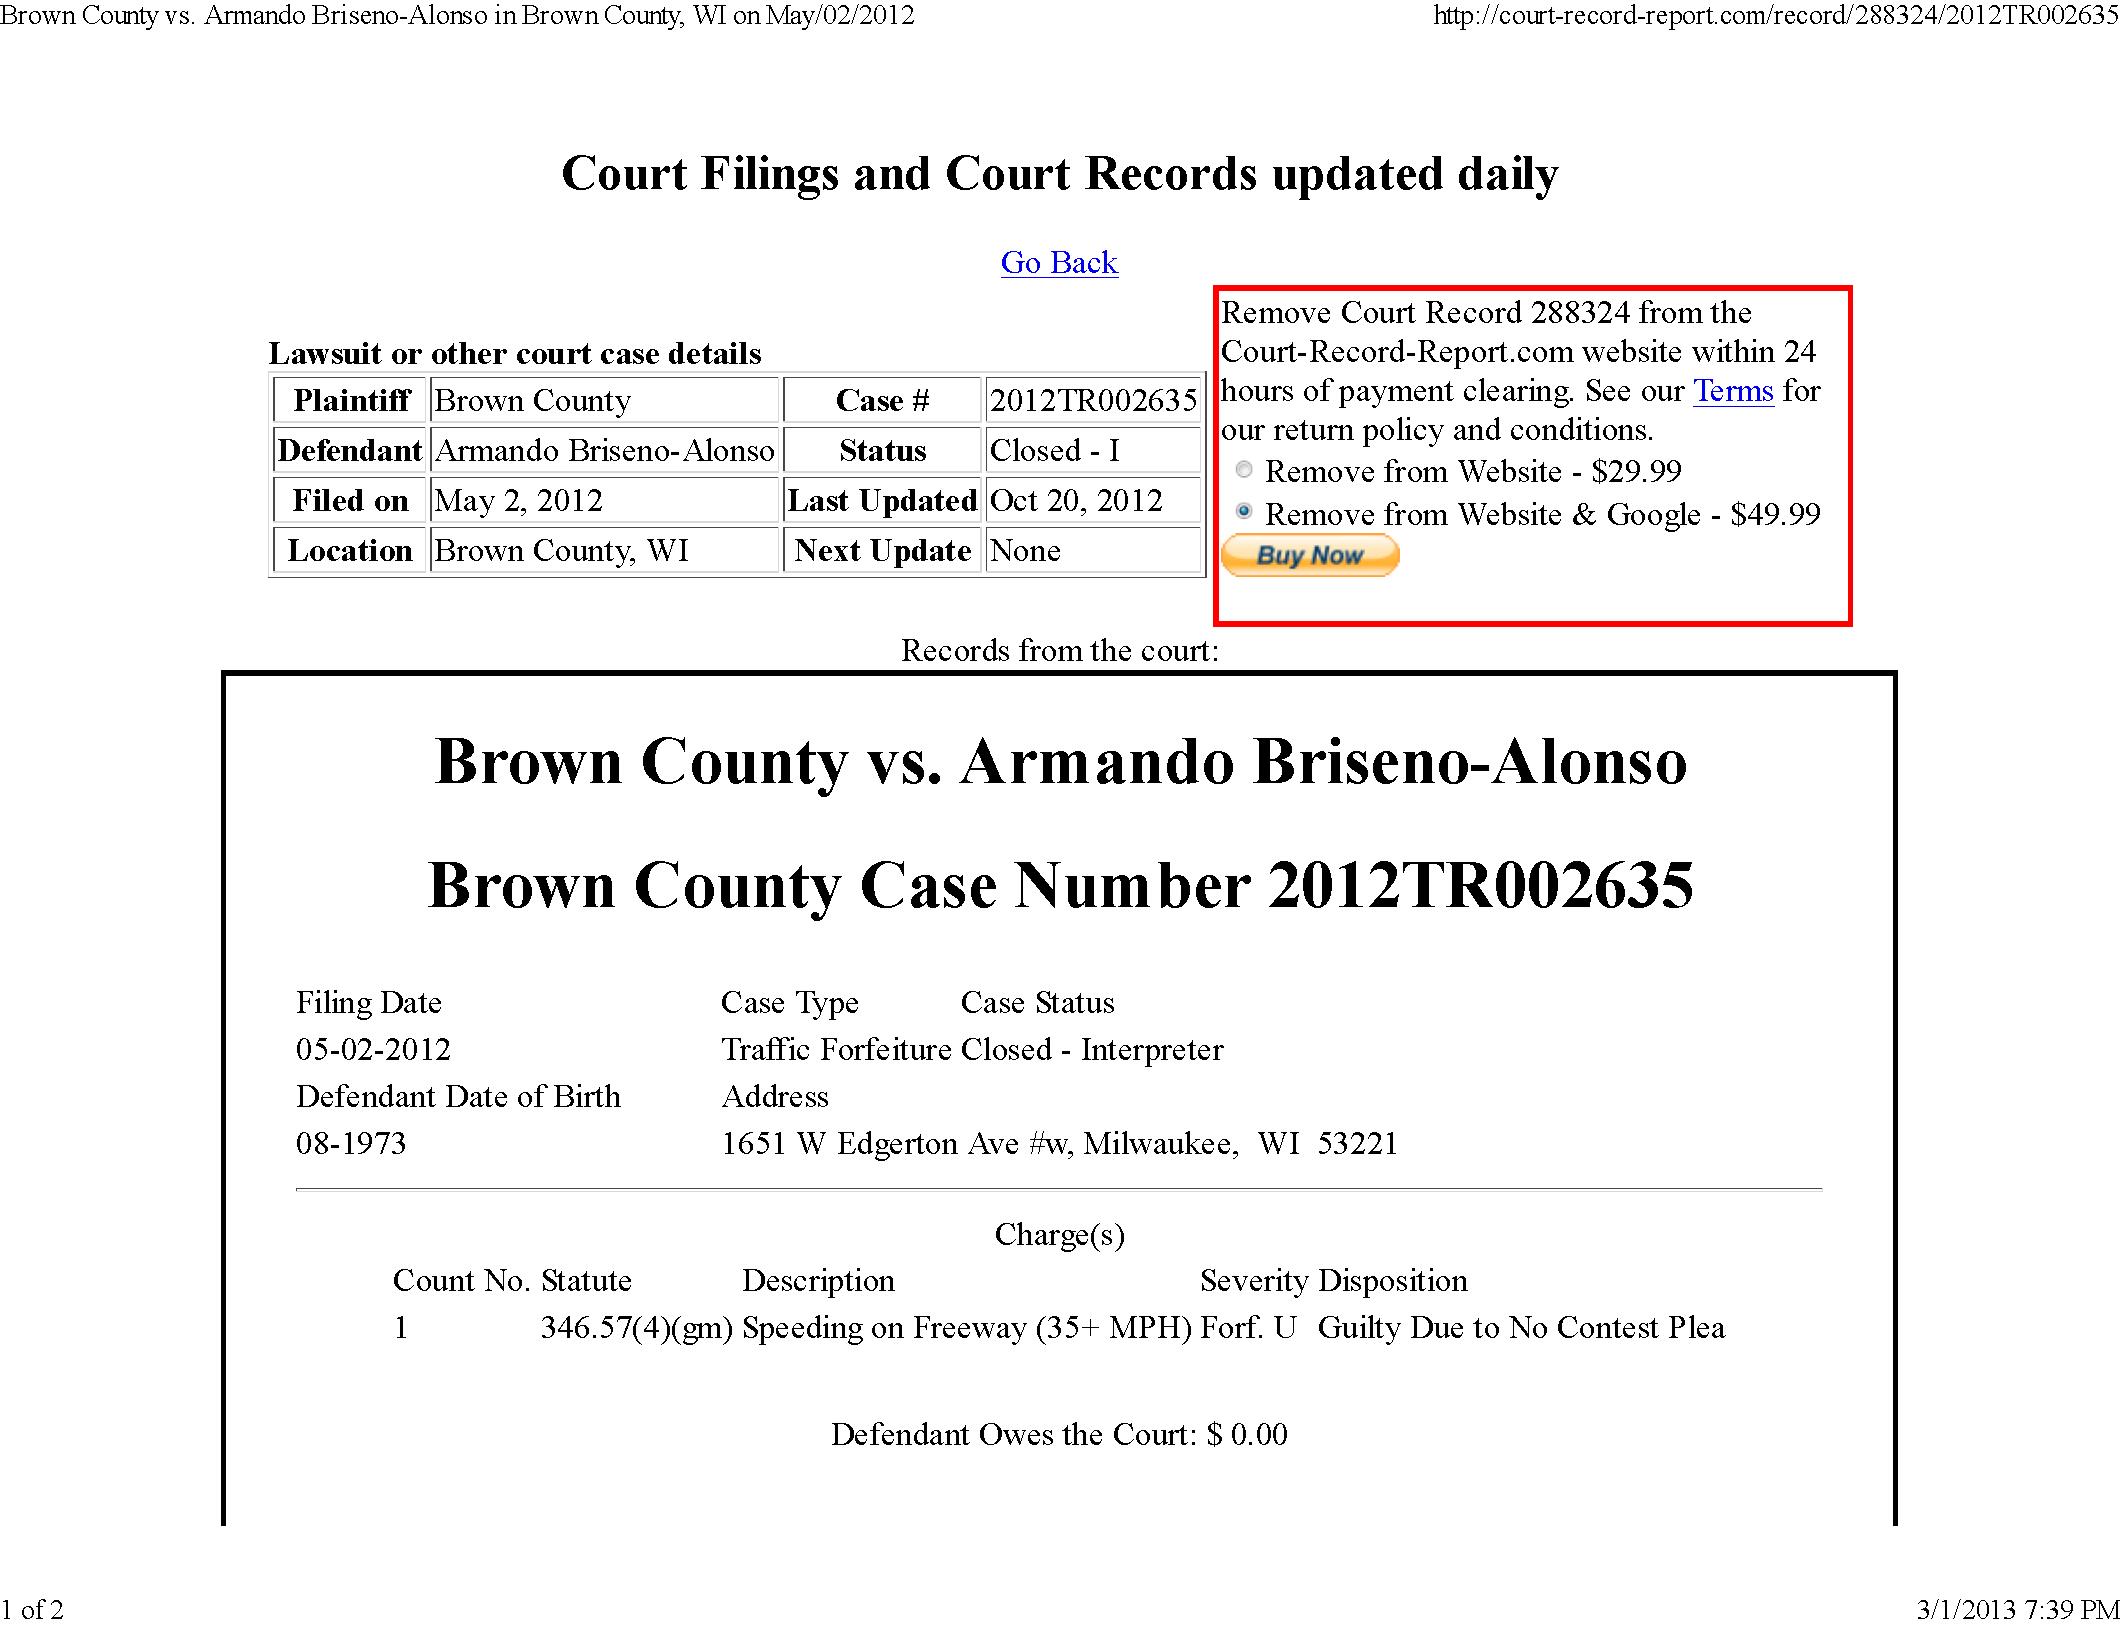 Copy of Briseno-Alonso Armando speeding ticket1.png